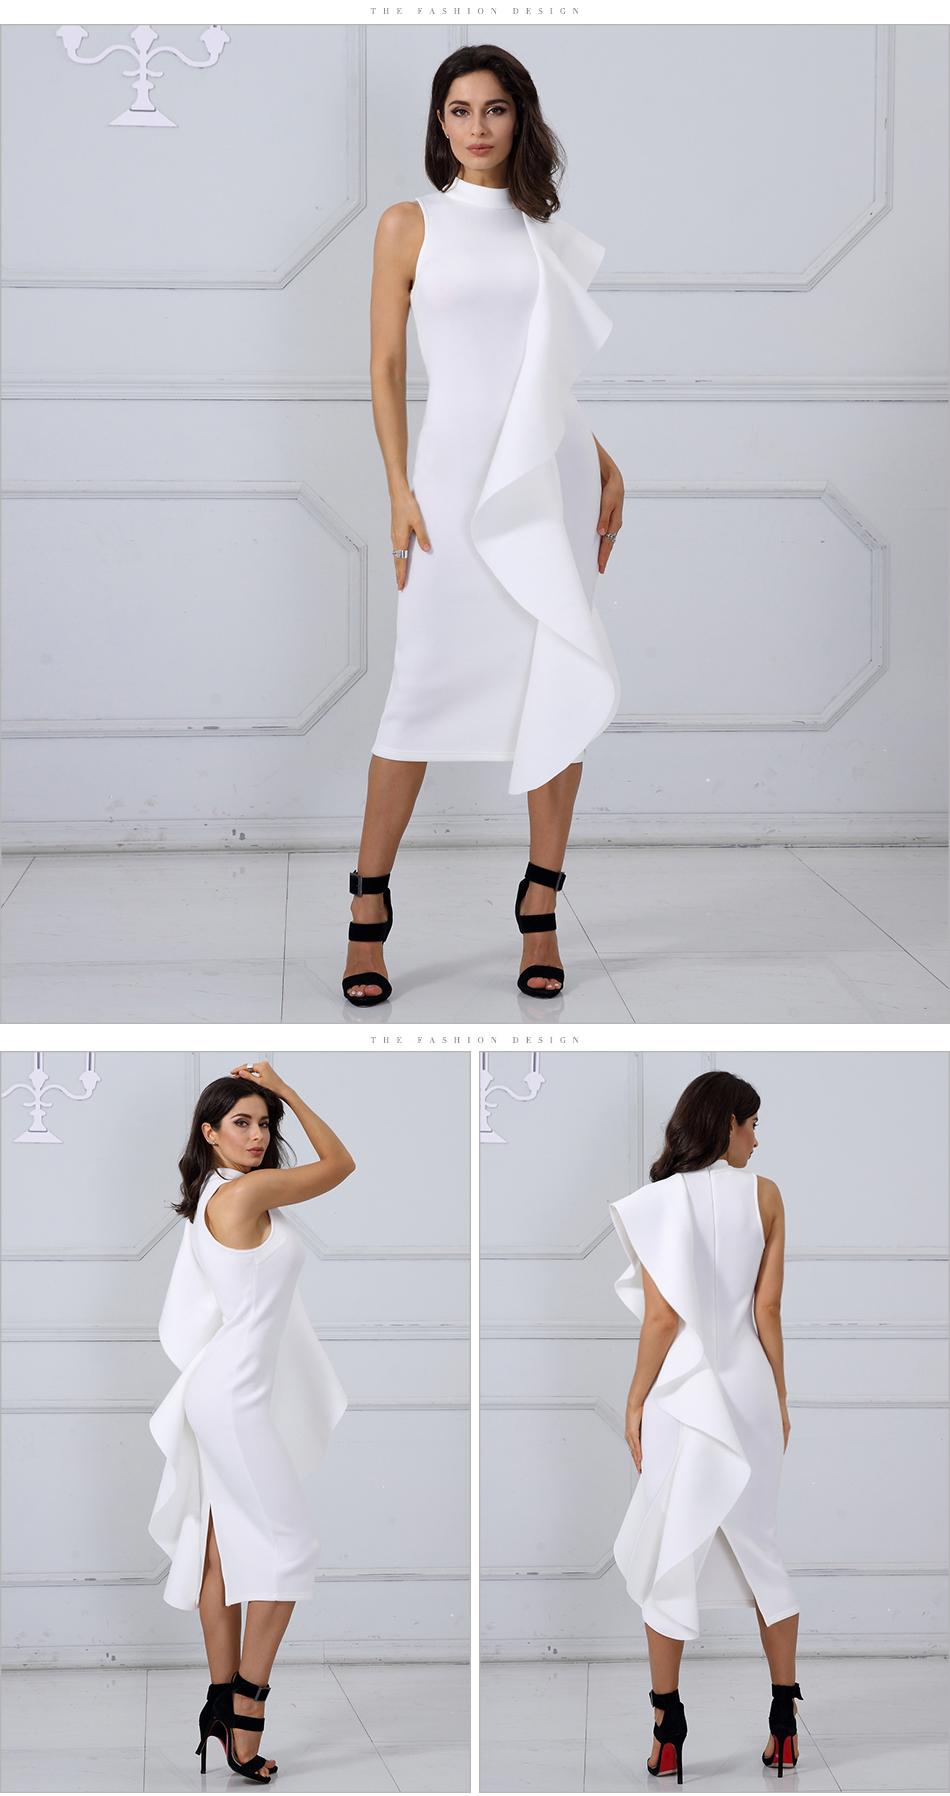 Adyce 2017 New Style Summer Dress Women Sexy White Sleeveless Patchwork Ruffles Mini Bodycon Vestidos Party Dresses Clubwear 18